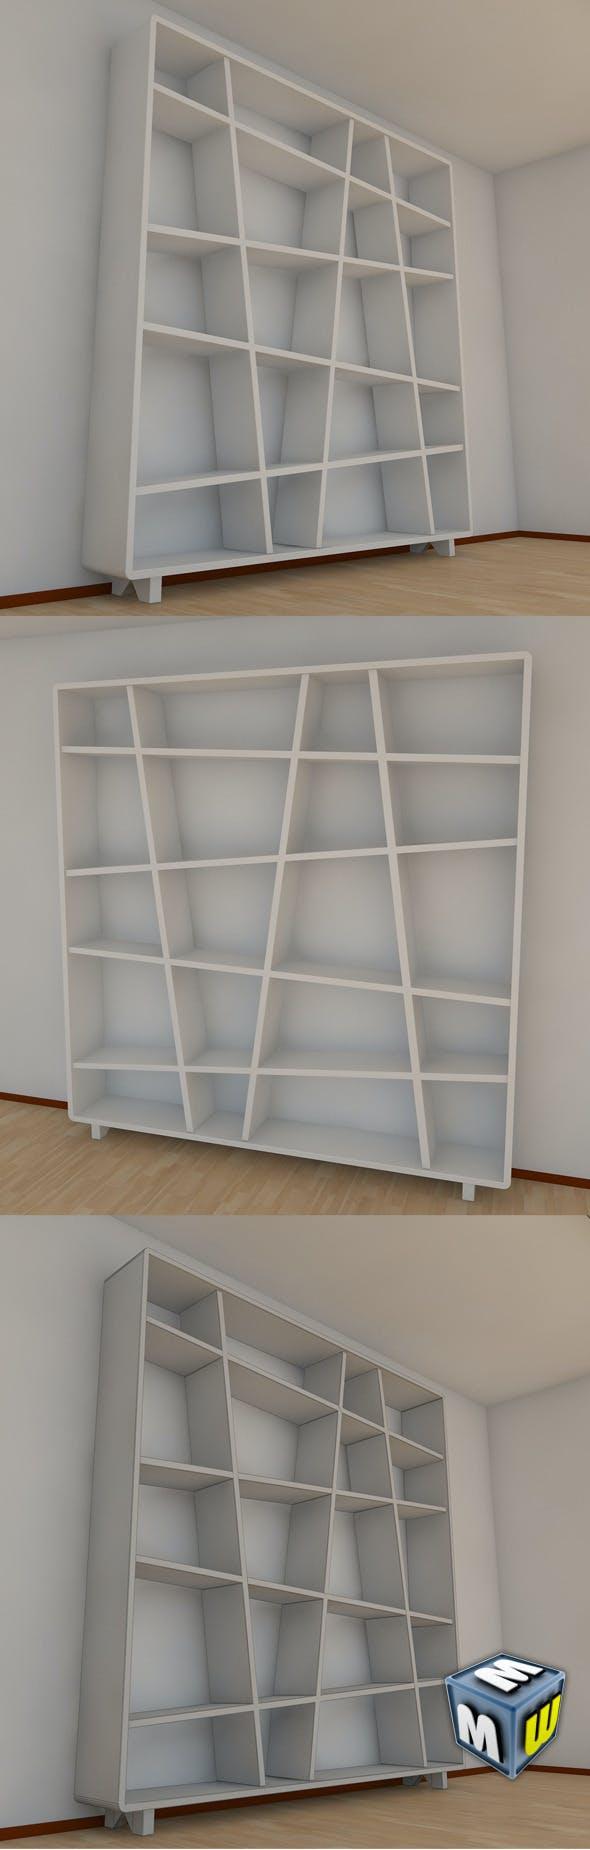 Bookshelf 10 MAX 2011 - 3DOcean Item for Sale